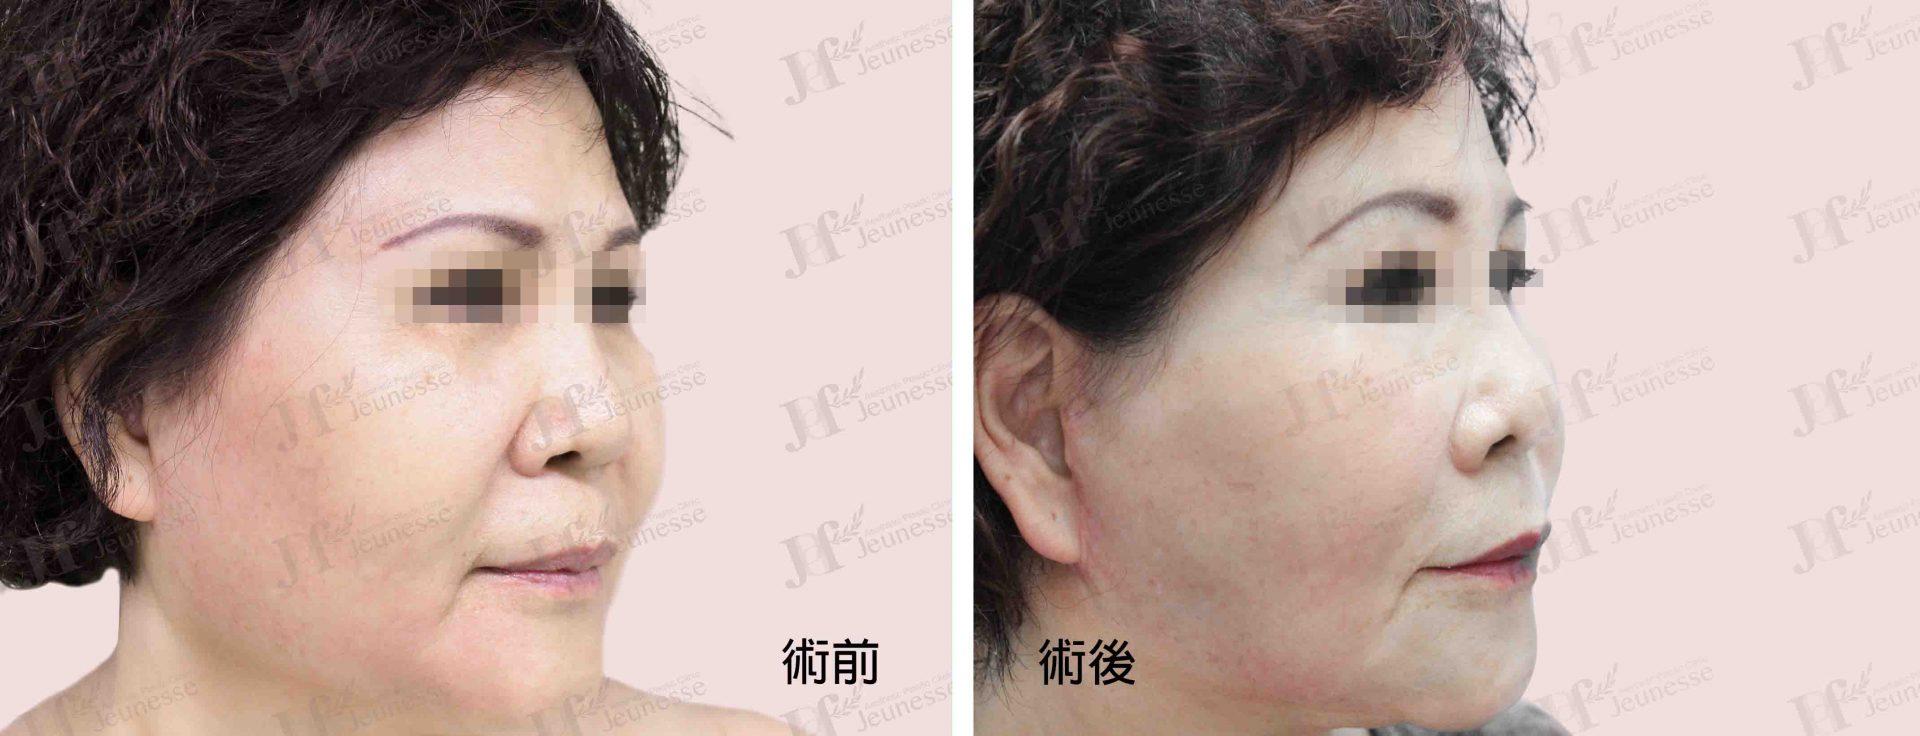 Midface lifting case 2 45度-浮水印